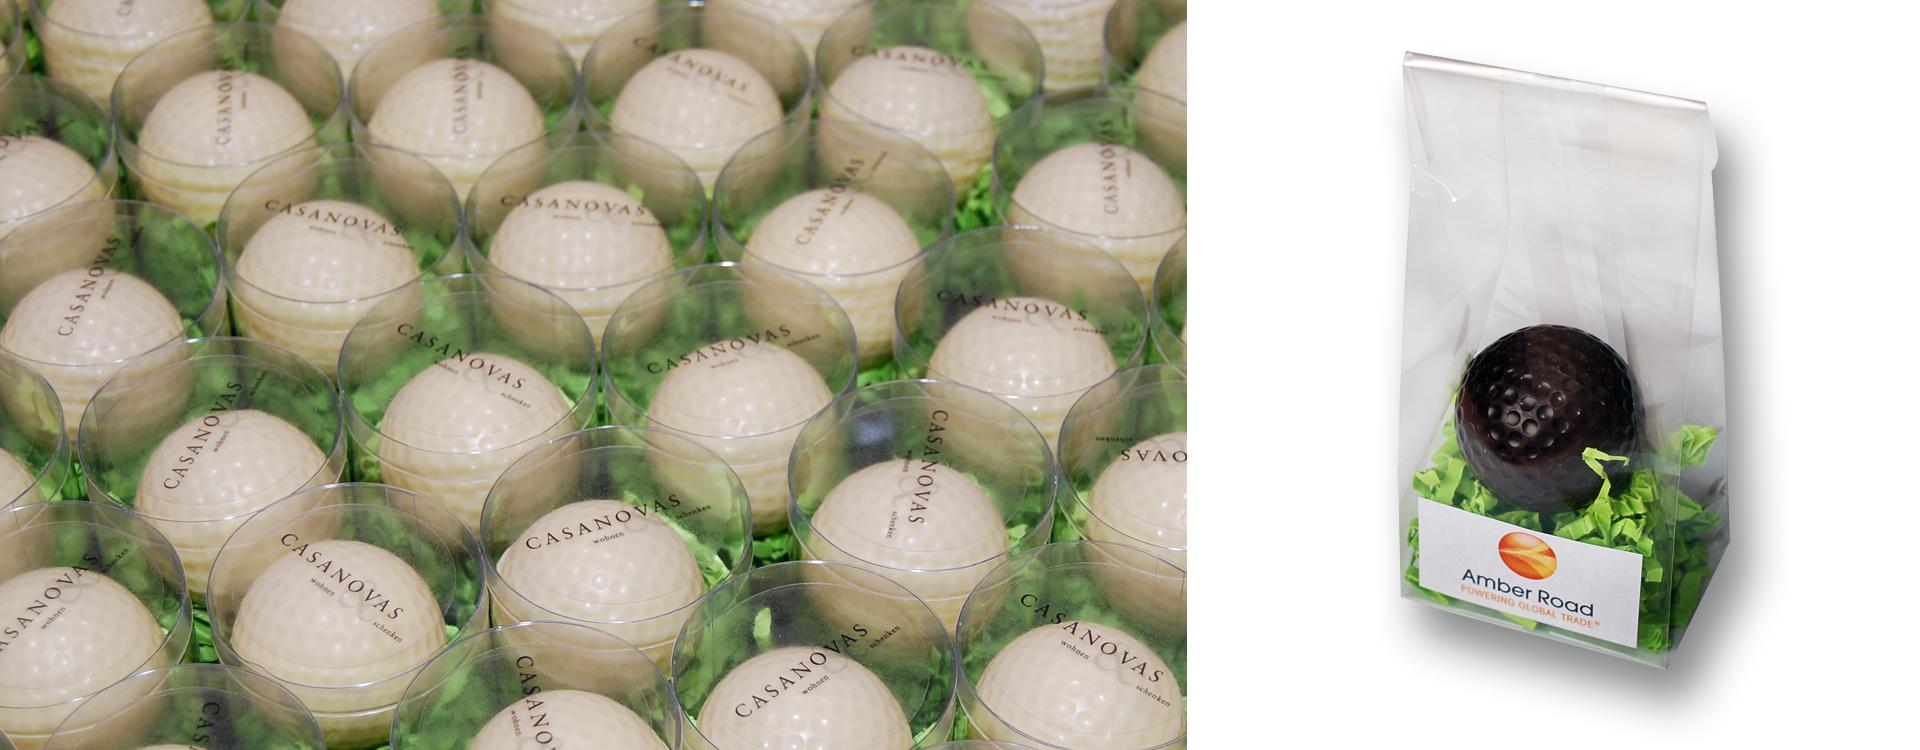 Golfbälle aus Schokolade